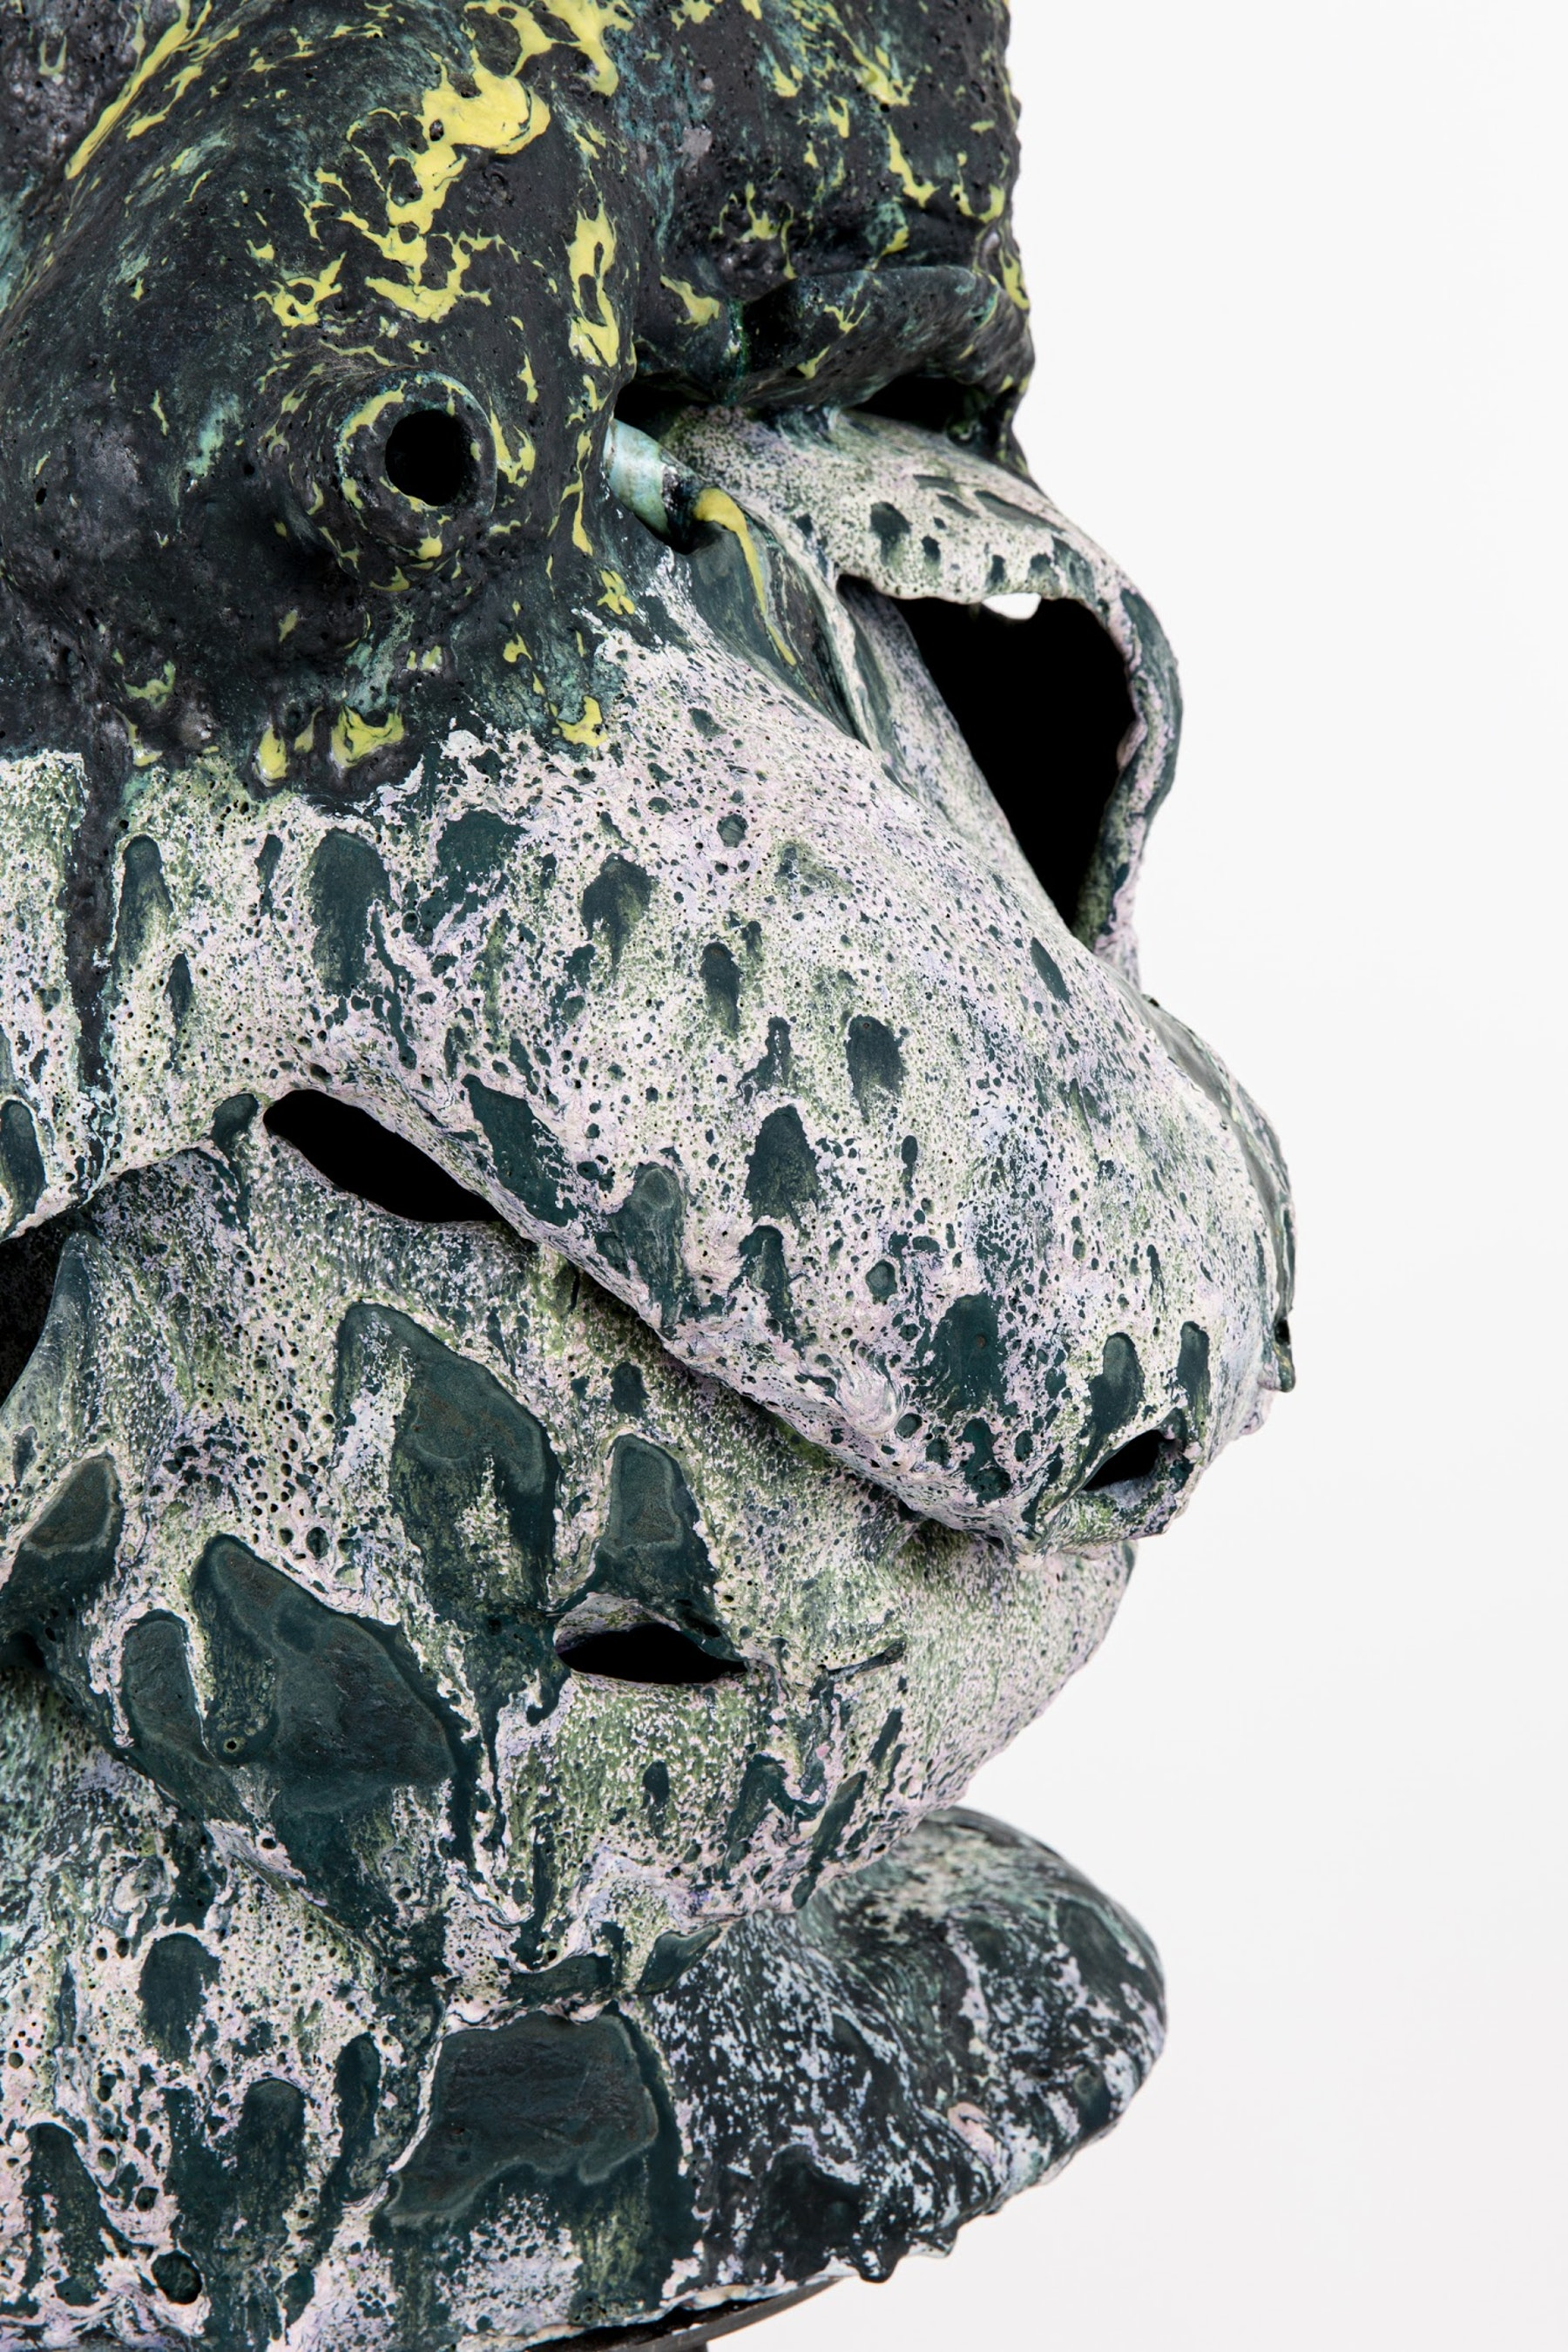 "Arlene Shechet ""Ganesha is a Mountain,"" 2020 Glazed ceramic, powder coated steel 68 x 21 x 19"" [HxWxD] (172.72 x 53.34 x 48.26 cm) Inventory #SHE161 Courtesy of the artist and Vielmetter Los Angeles. © Arlene Shechet Photo credit: Eva Deitch"